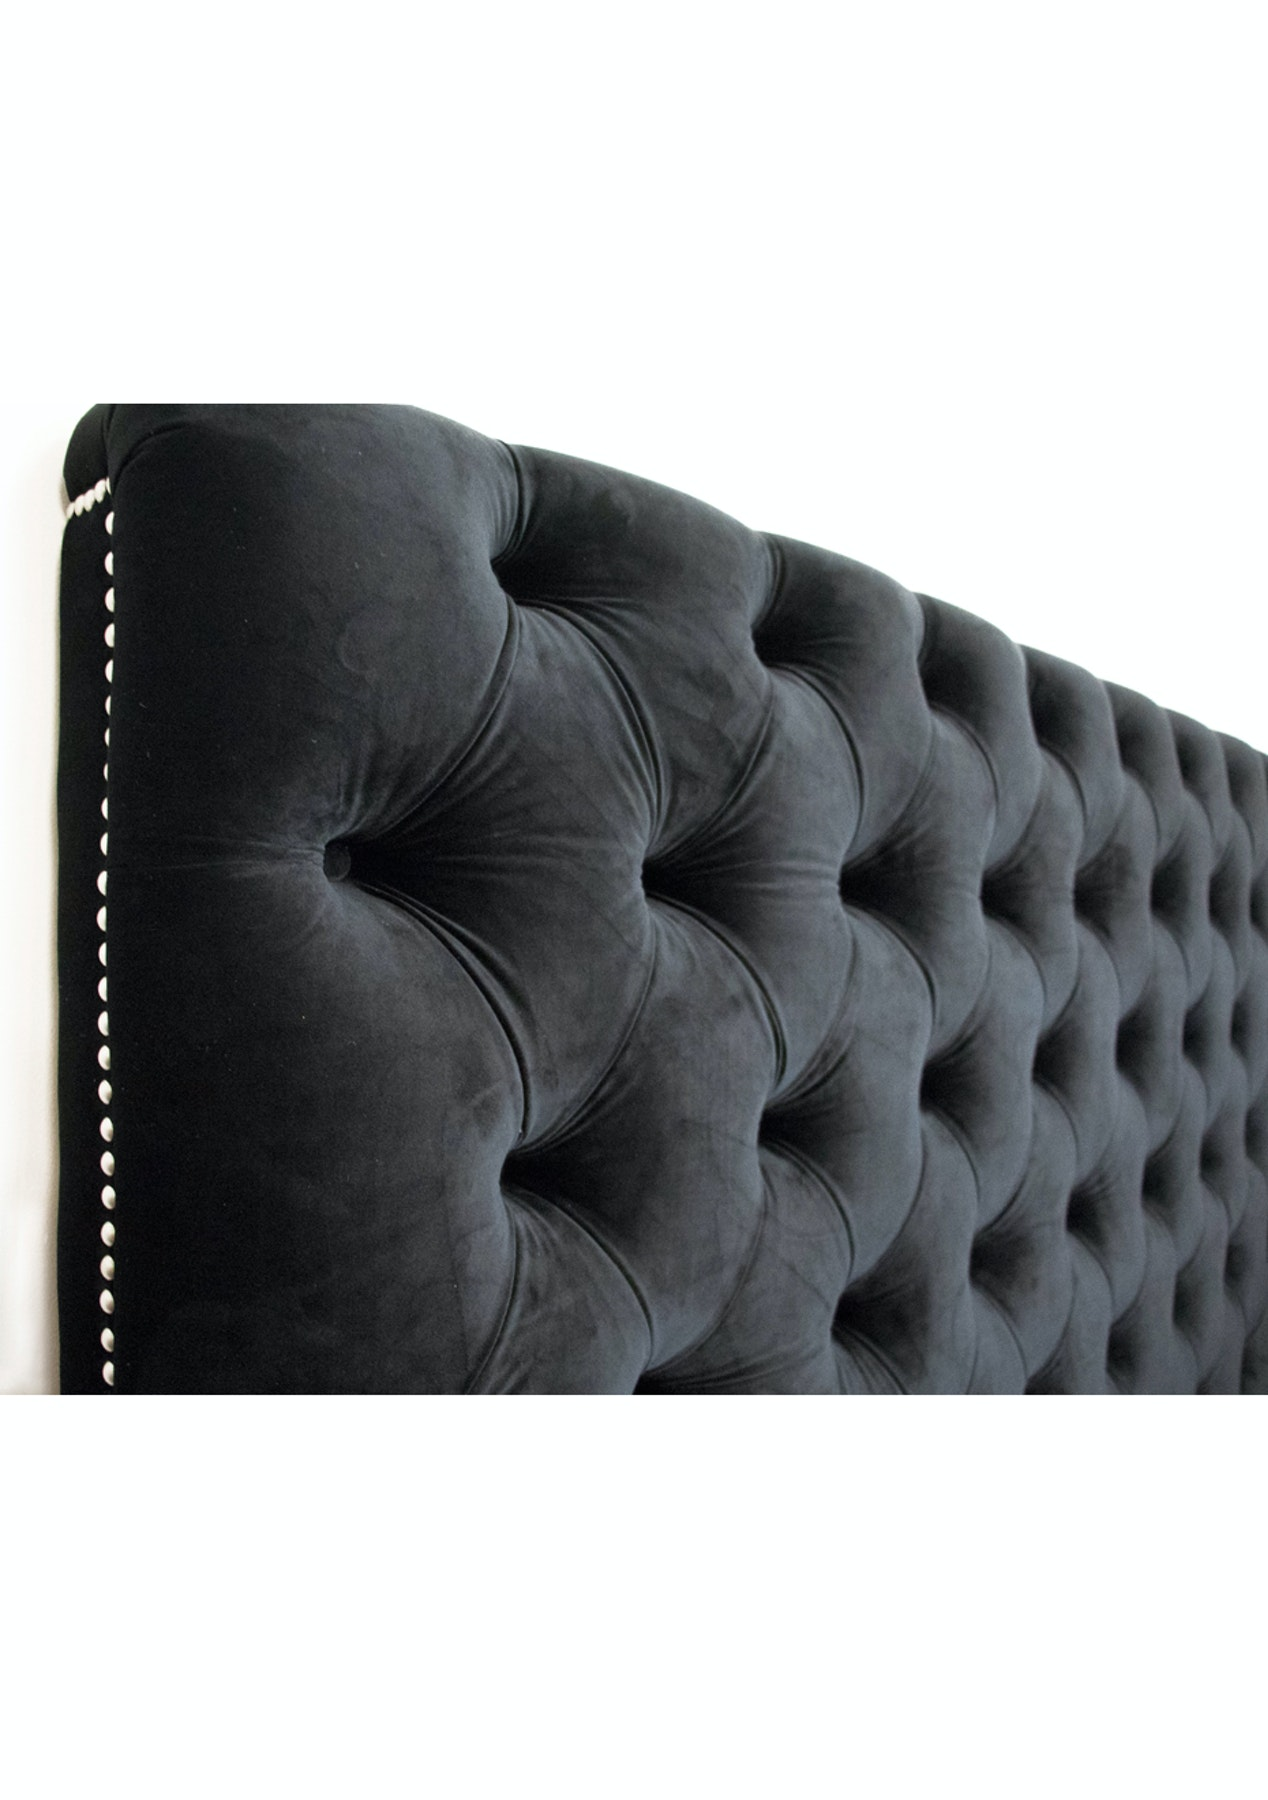 Velvet Headboard King Black Premium Headboards Ottomans Pre Onceit